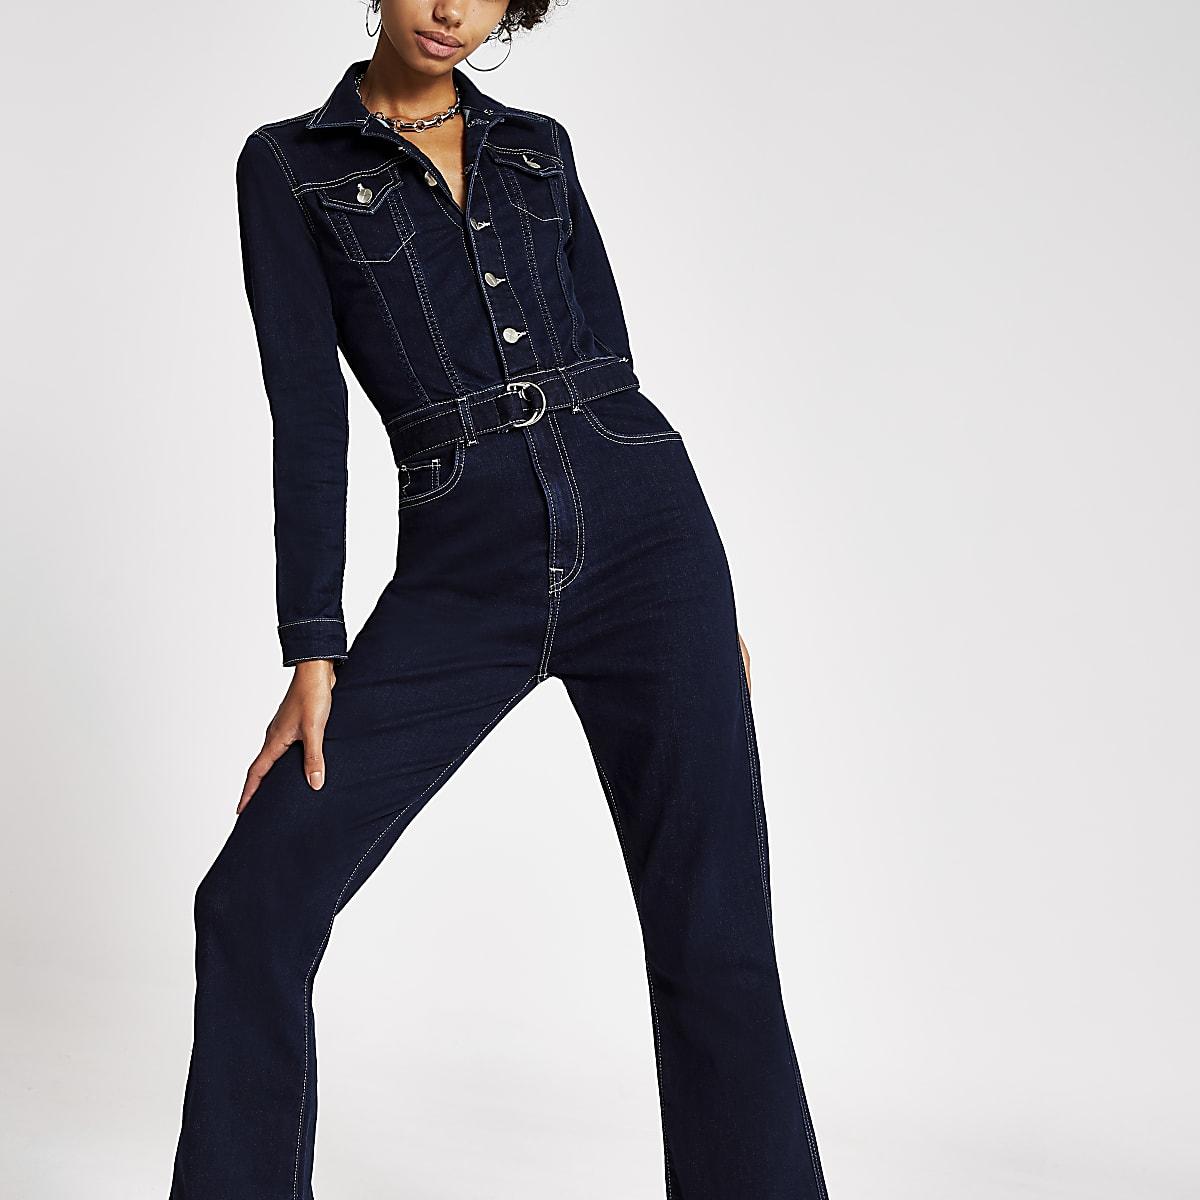 Dua Lipa x Pepe Jeans - Denim jumpsuit